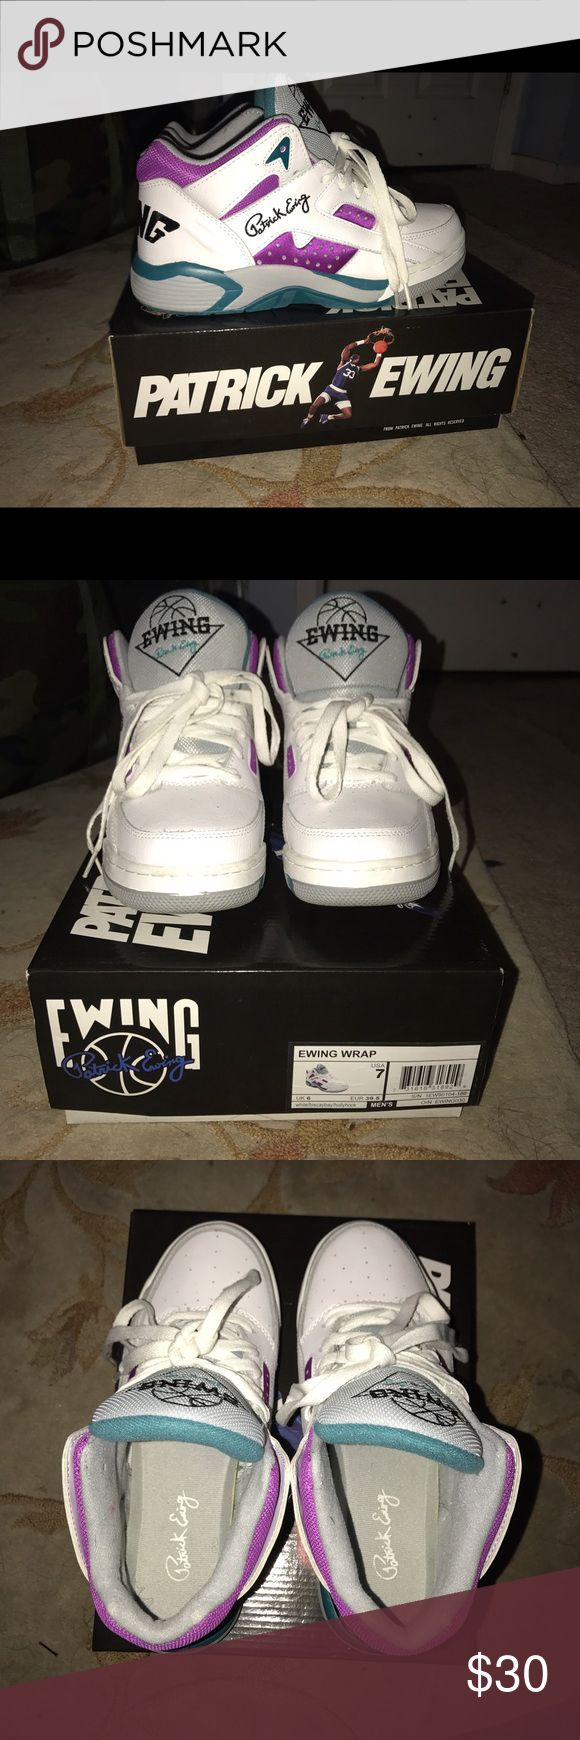 Selling this Patrick Ewings Sneakers on Poshmark! My username is: kurrnn_. #shopmycloset #poshmark #fashion #shopping #style #forsale #Patrick Ewings #Shoes